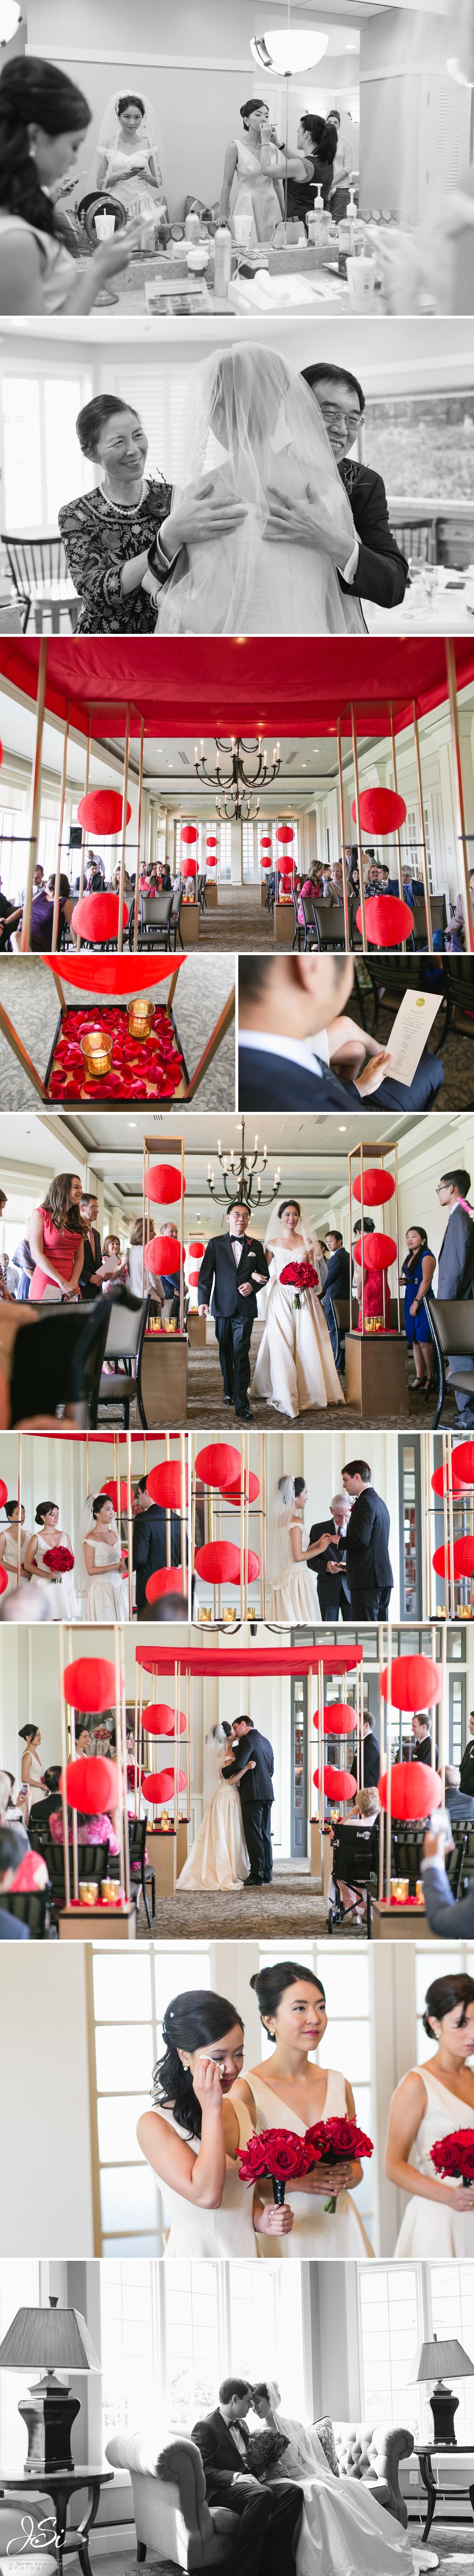 Kansas City Hallbrook Country Club happy romantic wedding photo